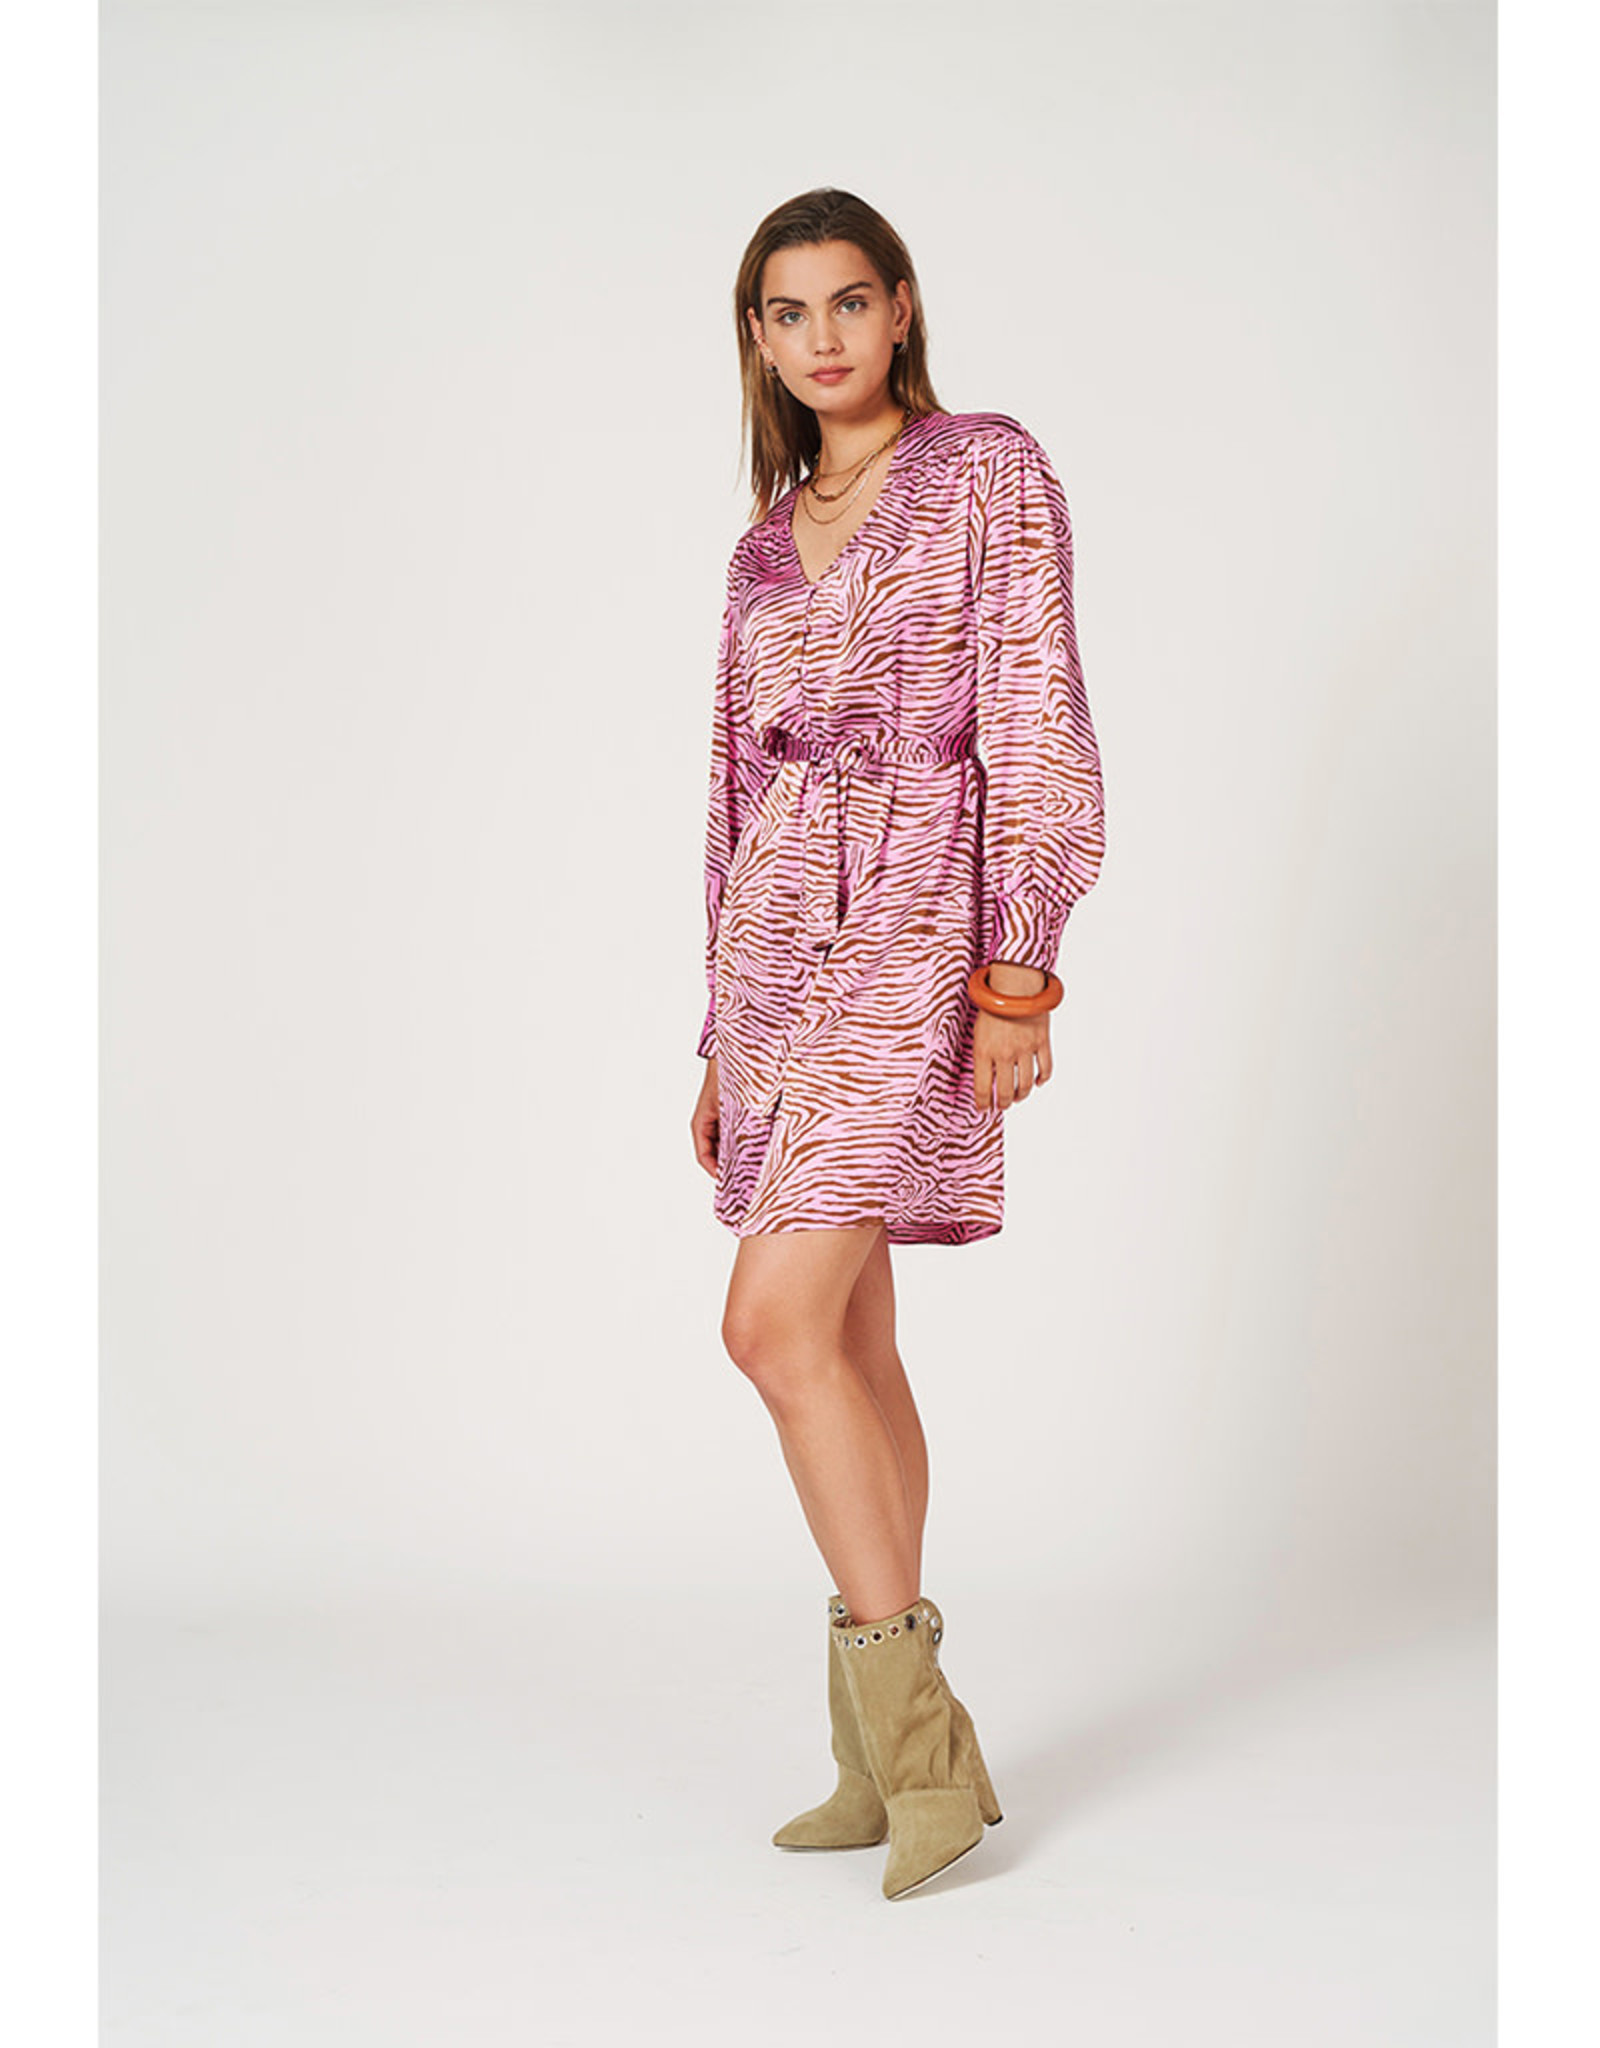 dante6 Roisin Print Dress